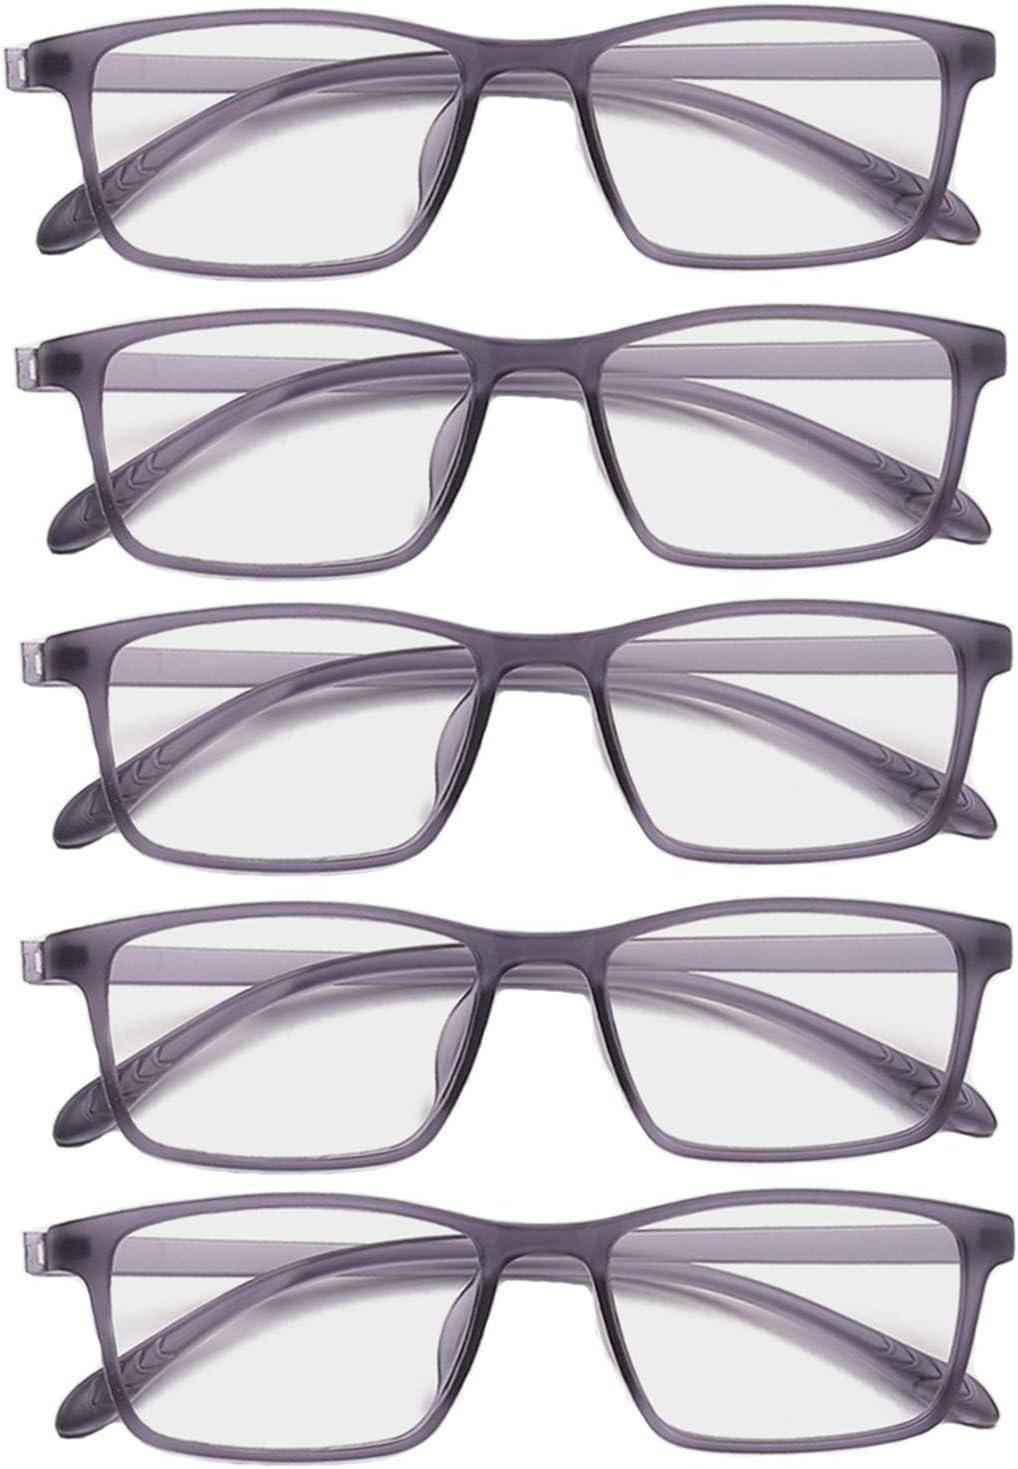 L-LIPENG Gafas de Filtro de Luz Azul, Gafas de Ordenador con Lente de Película Verde, Gafas Lectura Reduce Fatiga - 100% Protección UV/Radiacion - Marco Ultraligera de Moda (Paquete de 5),Gris,+1.5